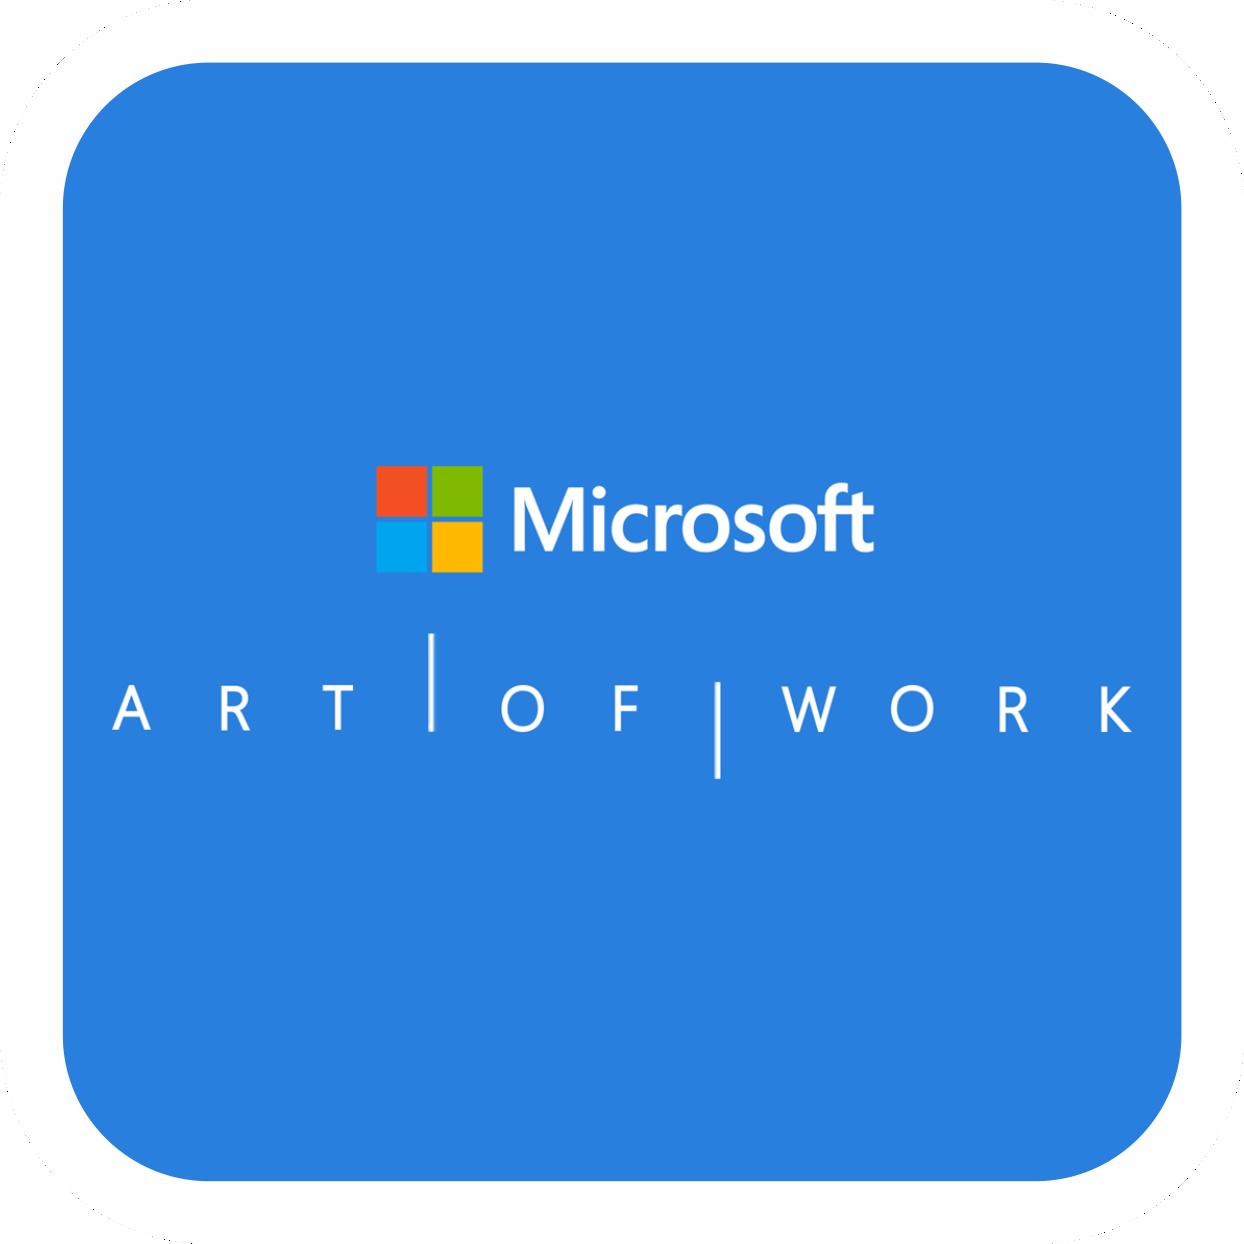 Art Of work by Microsoft